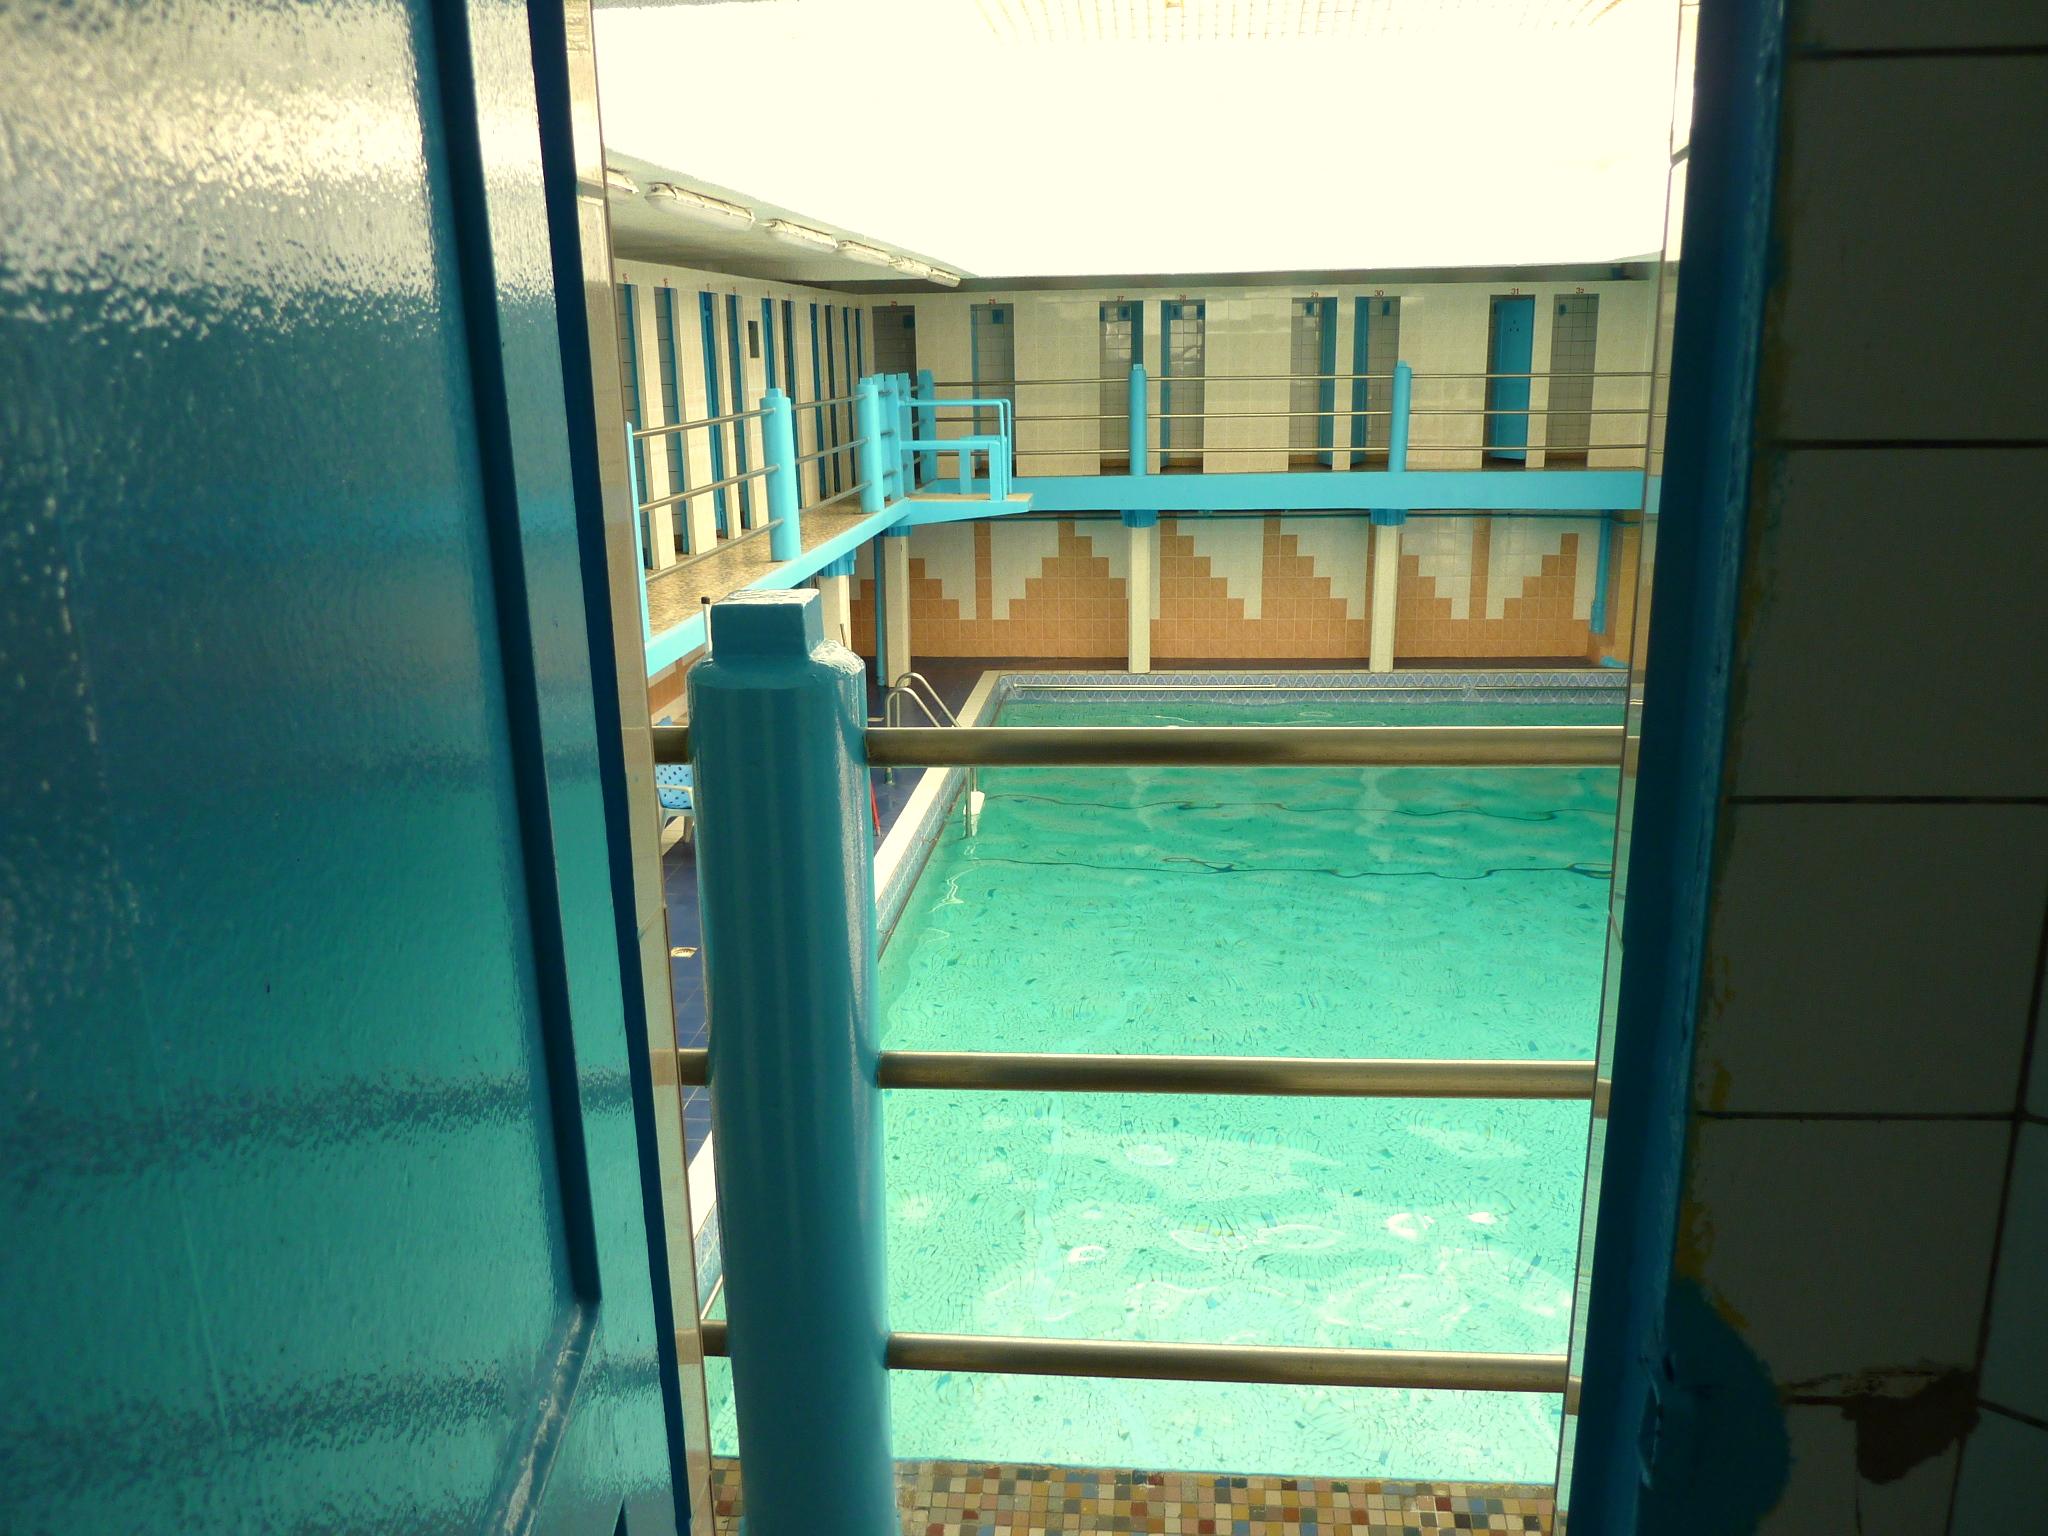 piscine oberkampf radio piscine. Black Bedroom Furniture Sets. Home Design Ideas